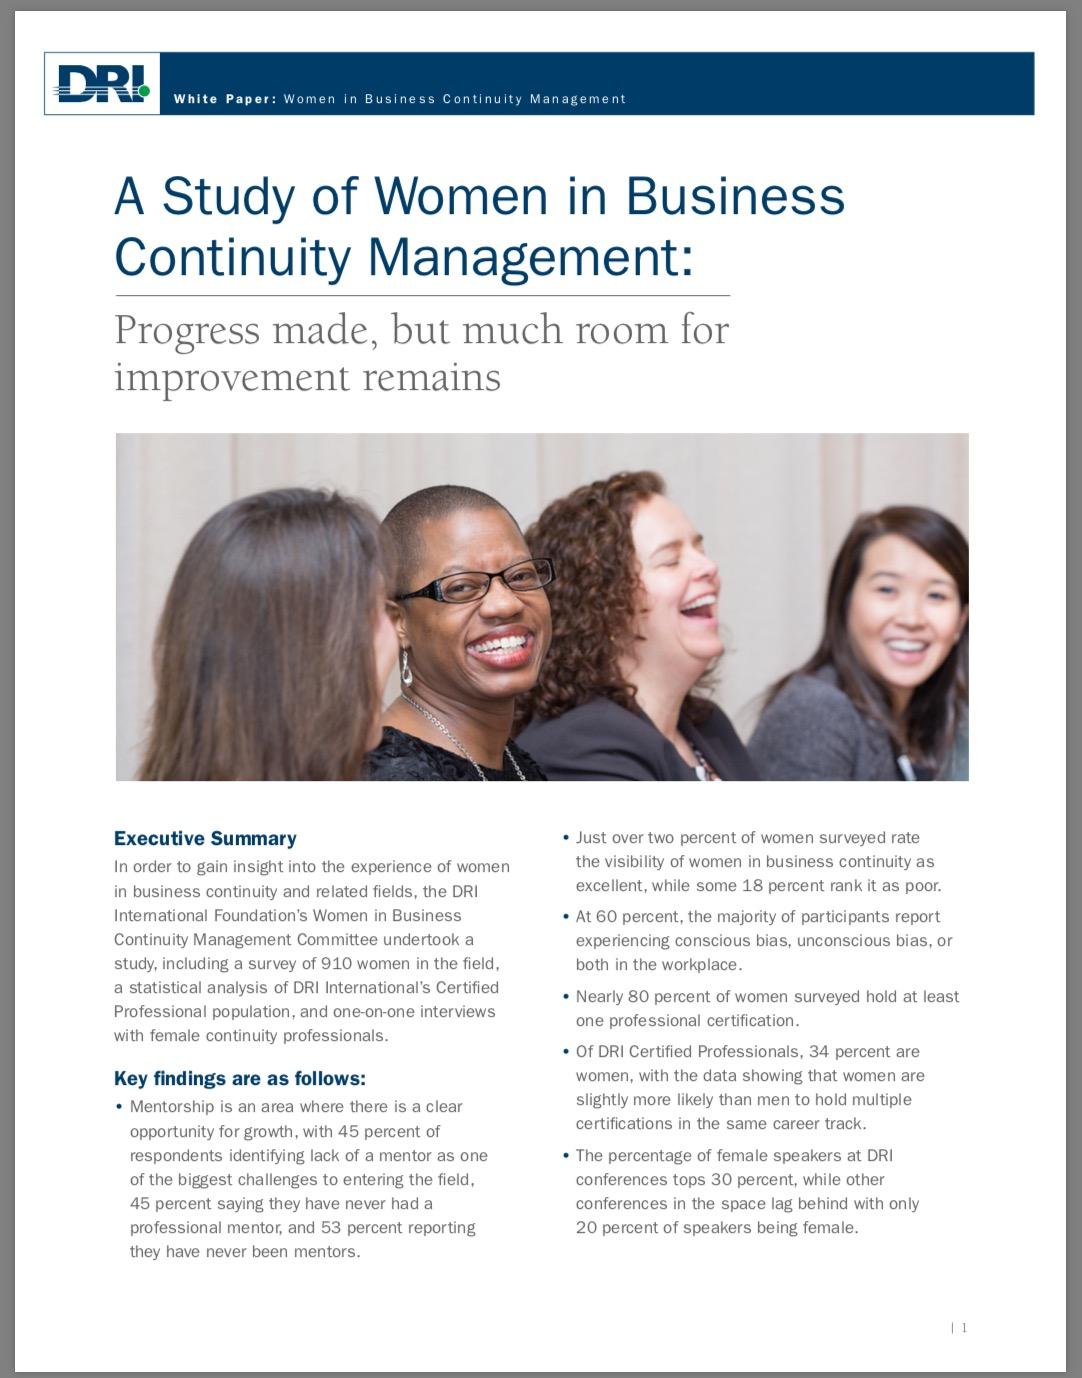 Press releases dri new dri white paper women in business continuity management xflitez Choice Image